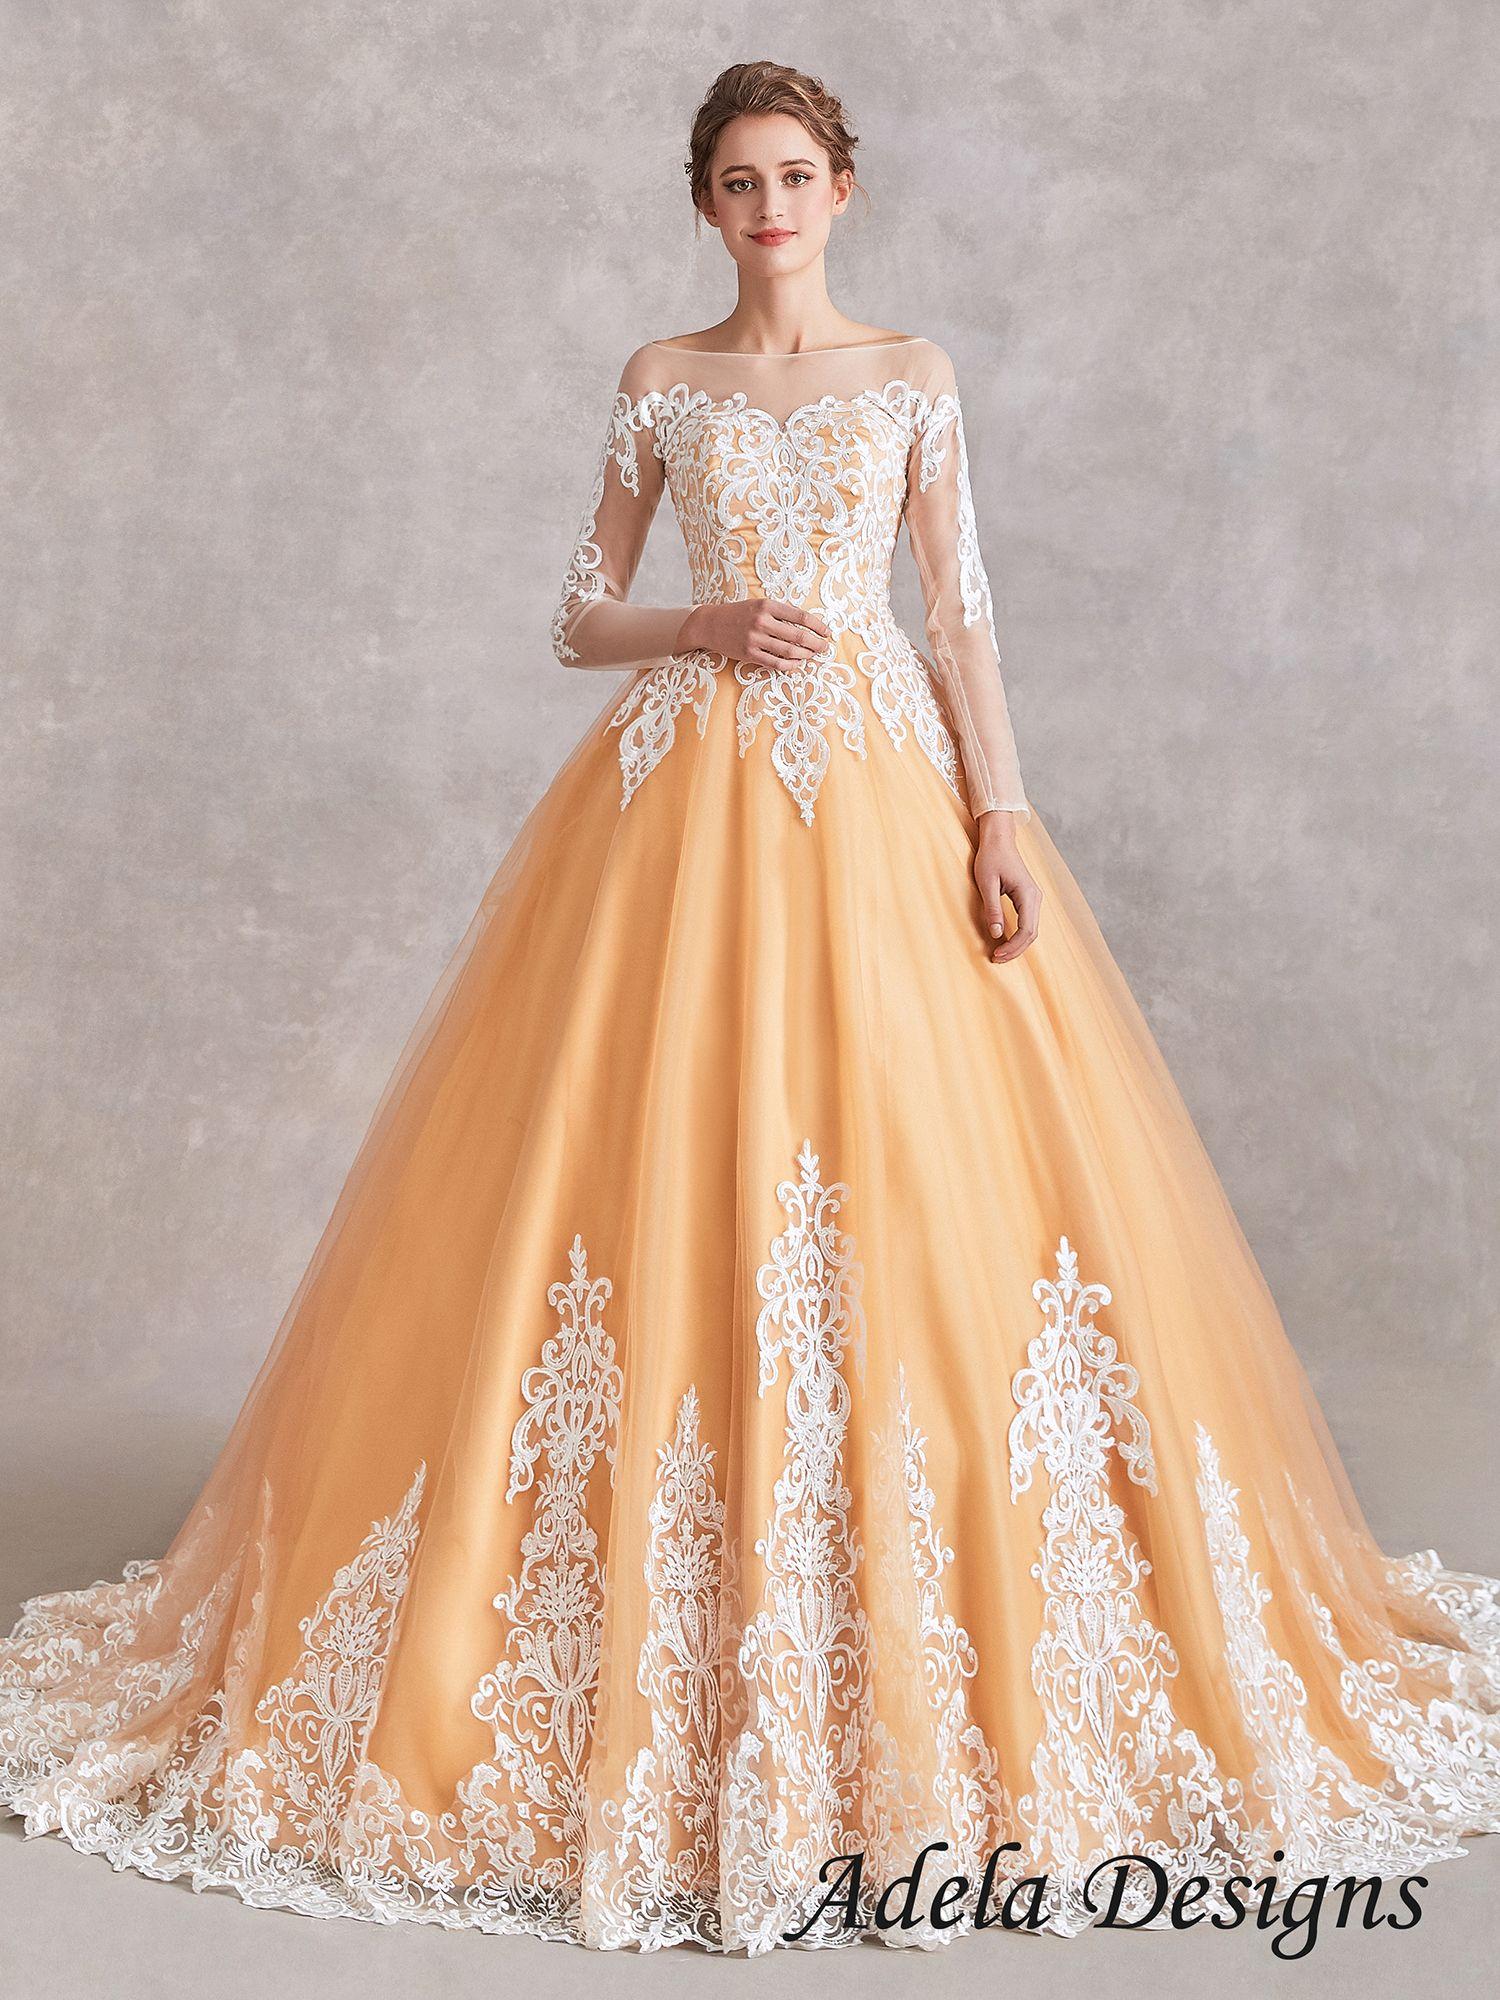 Gold Ivory Ball Gown Wedding Dress Ball Gowns Ivory Ball Gown Red Ball Gowns [ 2000 x 1500 Pixel ]